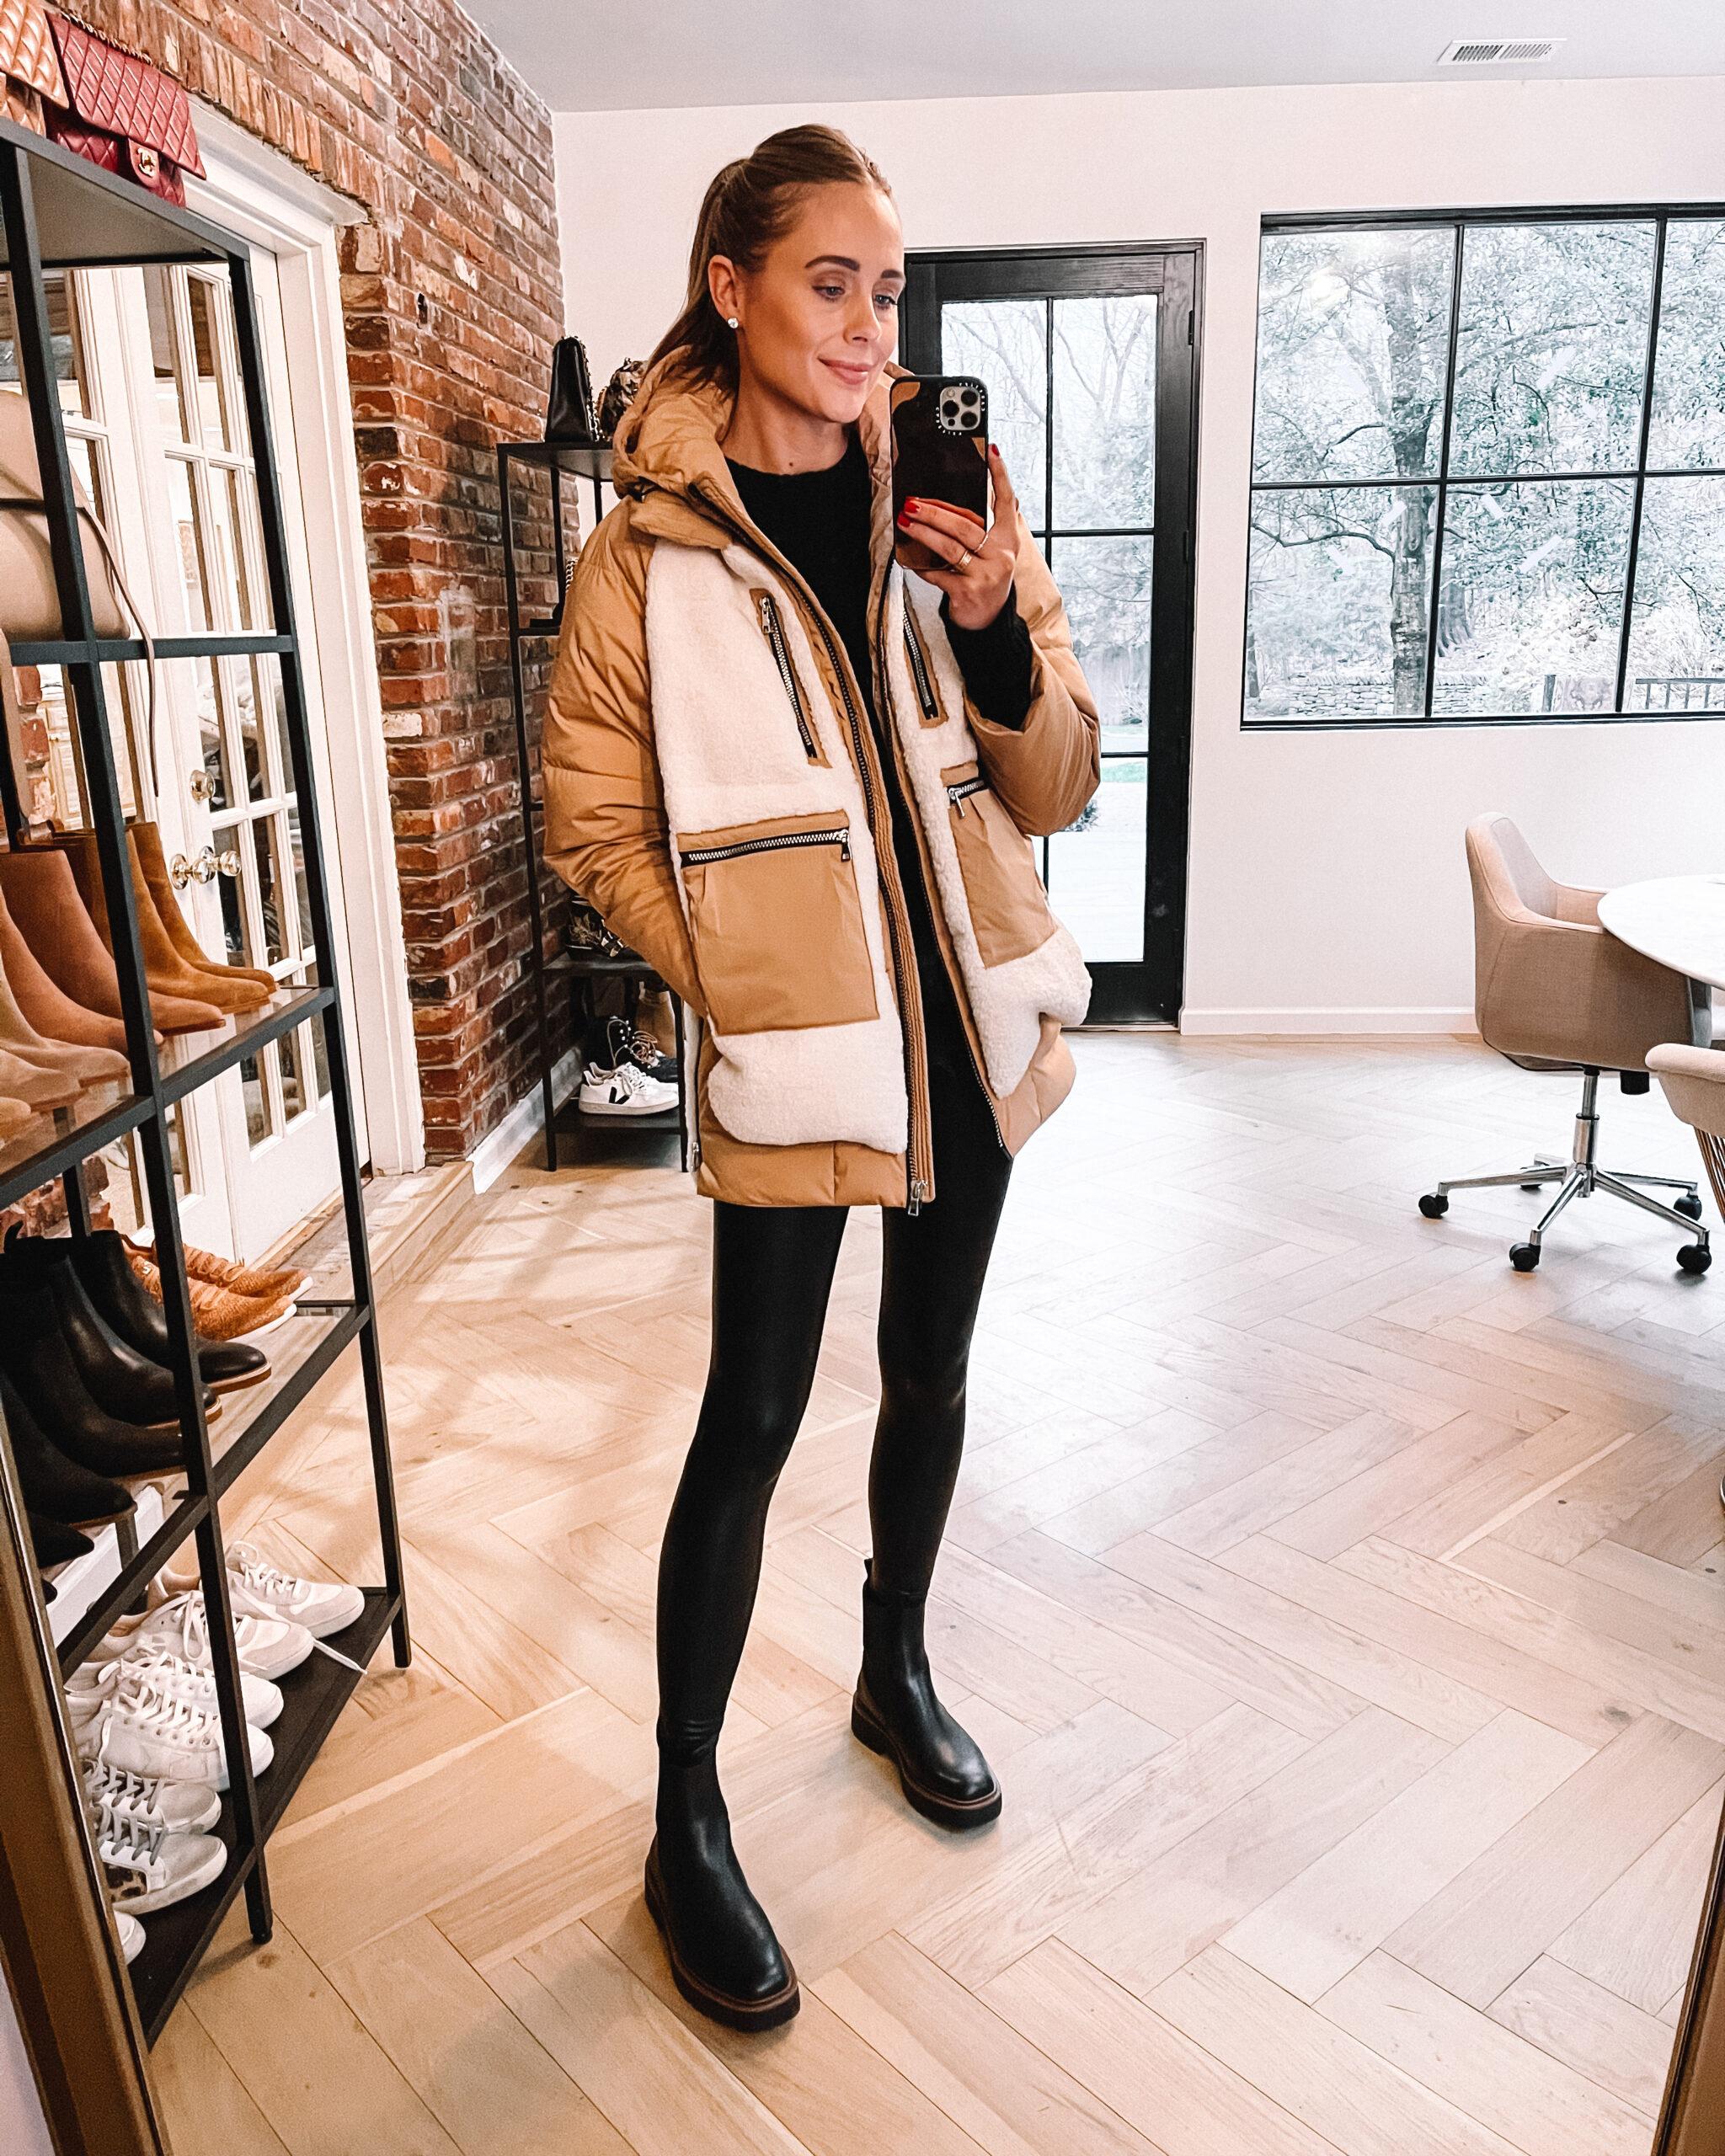 Fashion Jackson Wearing Amazon Fashion Fleece puffer Jacket Commando Faux Leather Leggings Lug Sole Black Boots